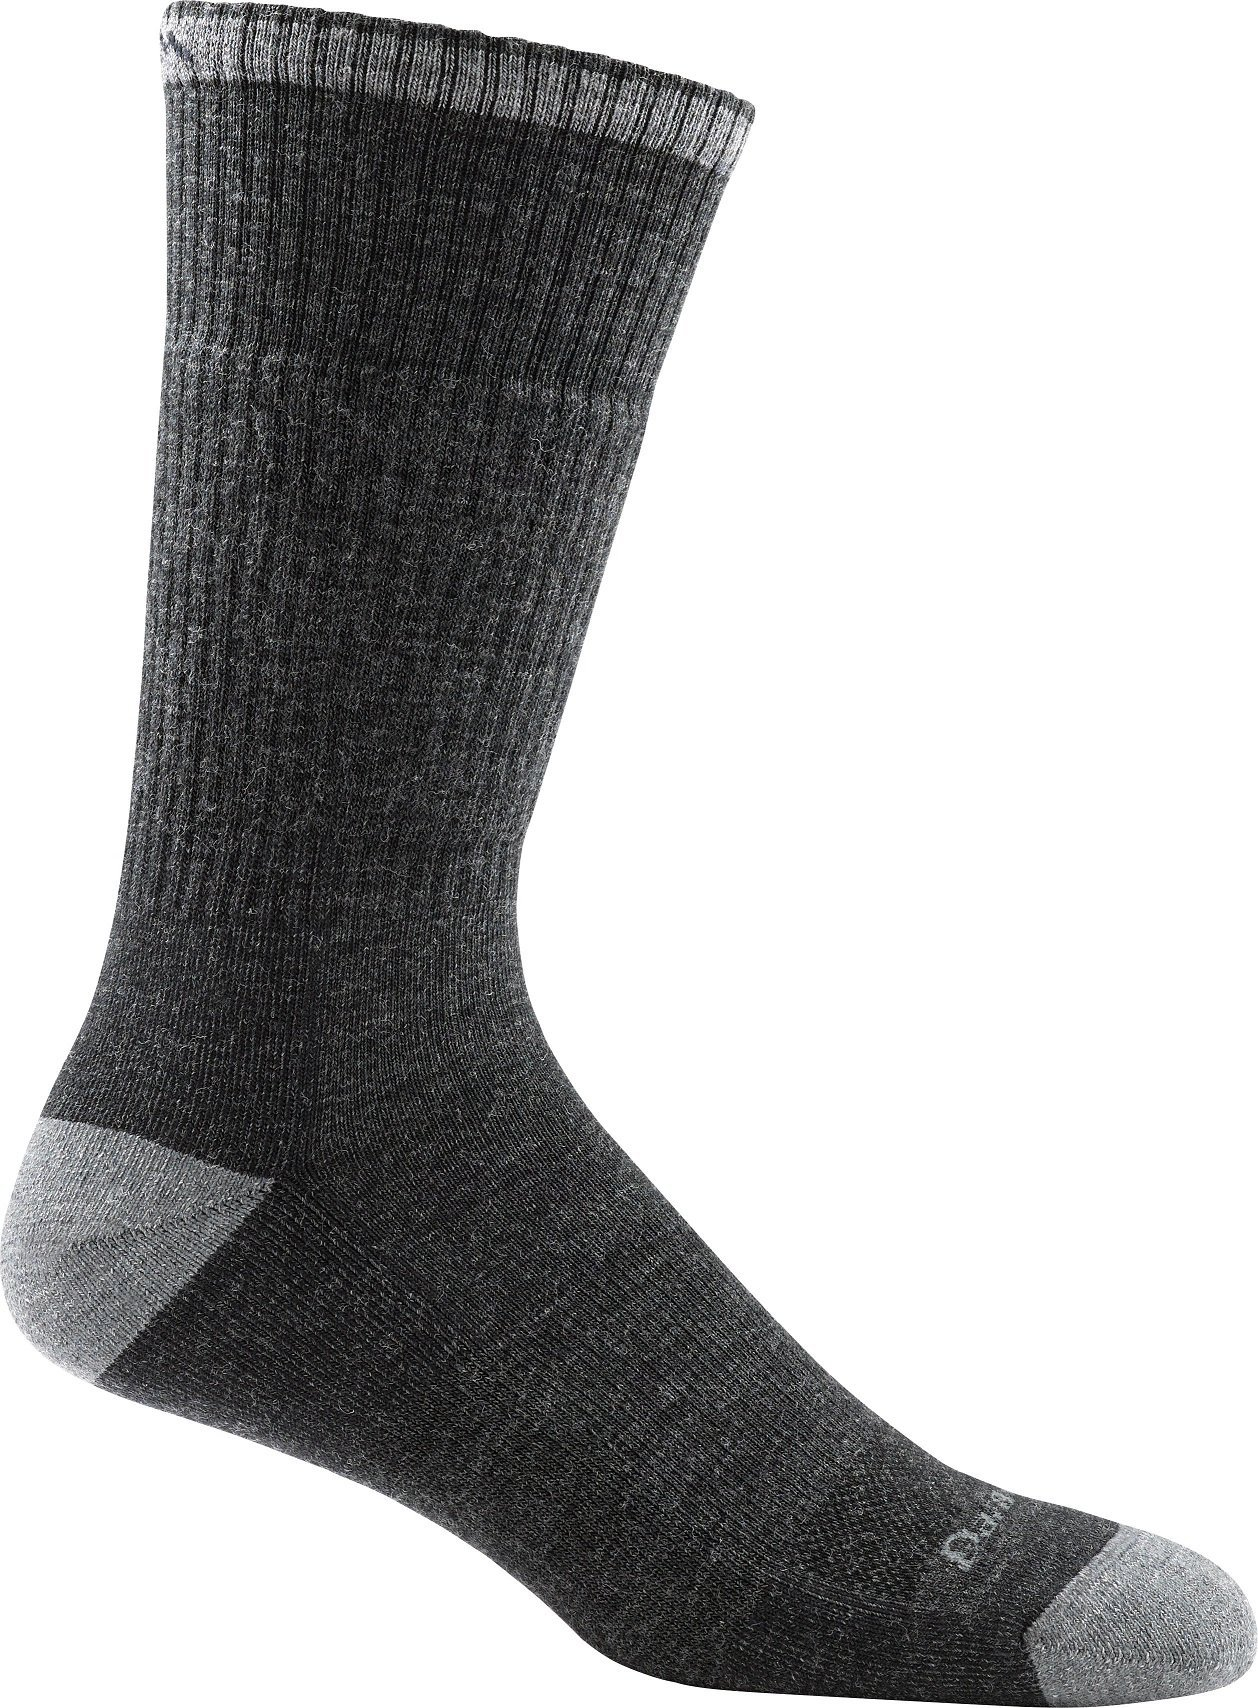 Darn Tough John Henry Boot Cushion Socks - Men's Gravel Large by Darn Tough